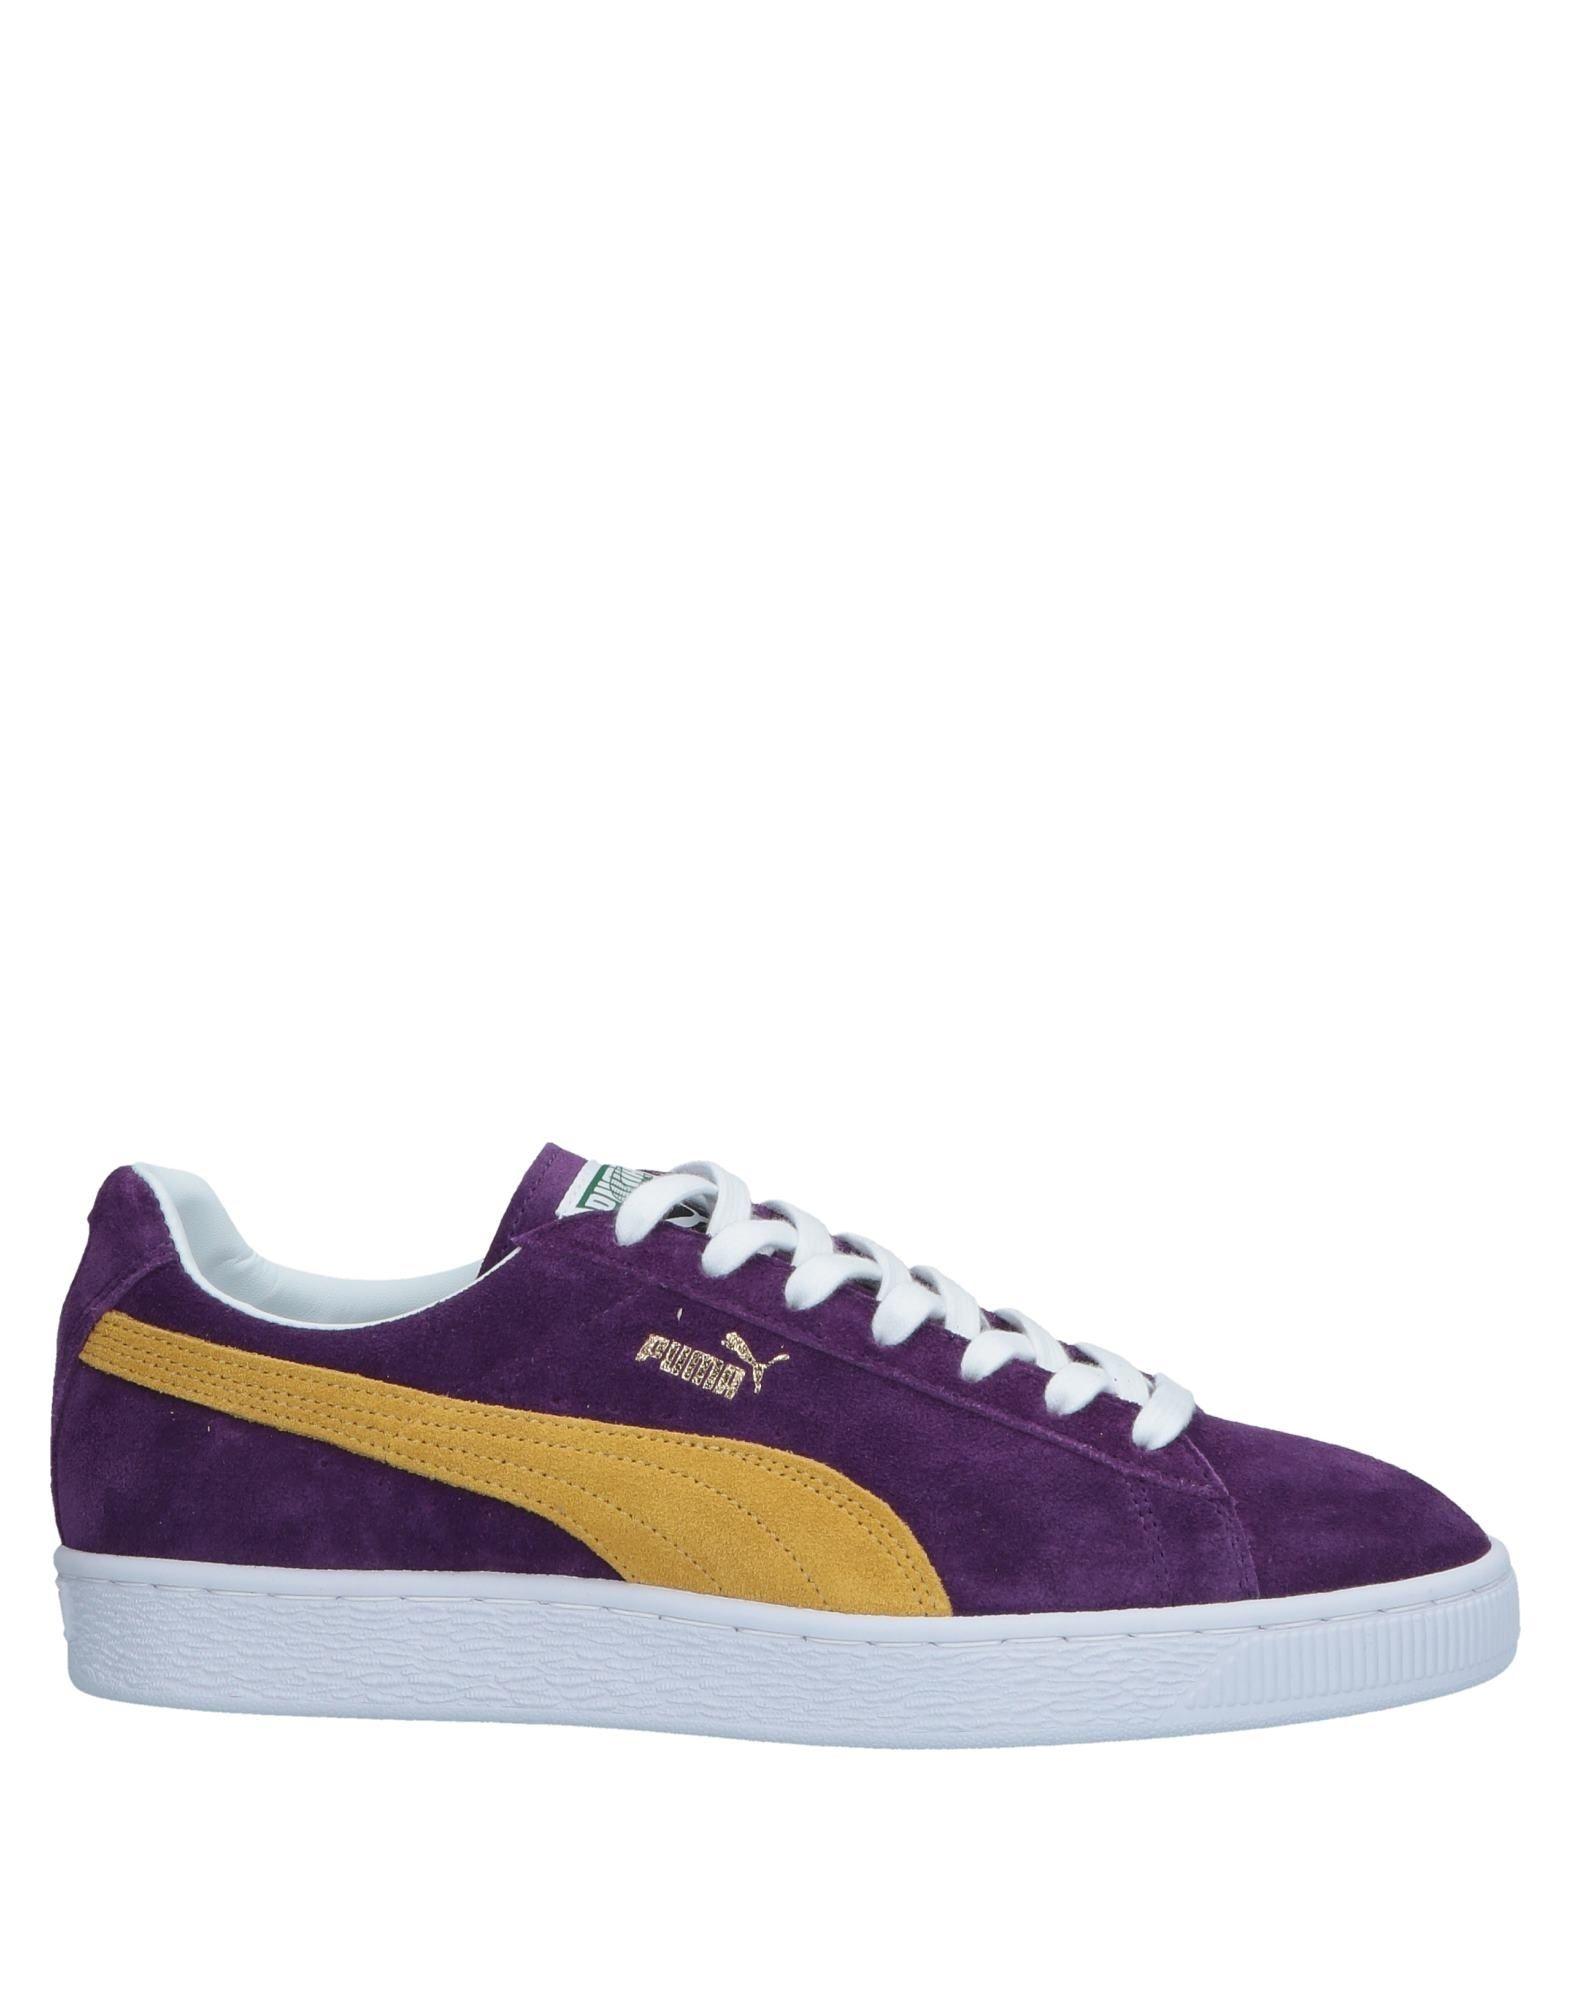 Puma Sneakers - Women Puma Sneakers Kingdom online on  United Kingdom Sneakers - 11559335NT 9cf627